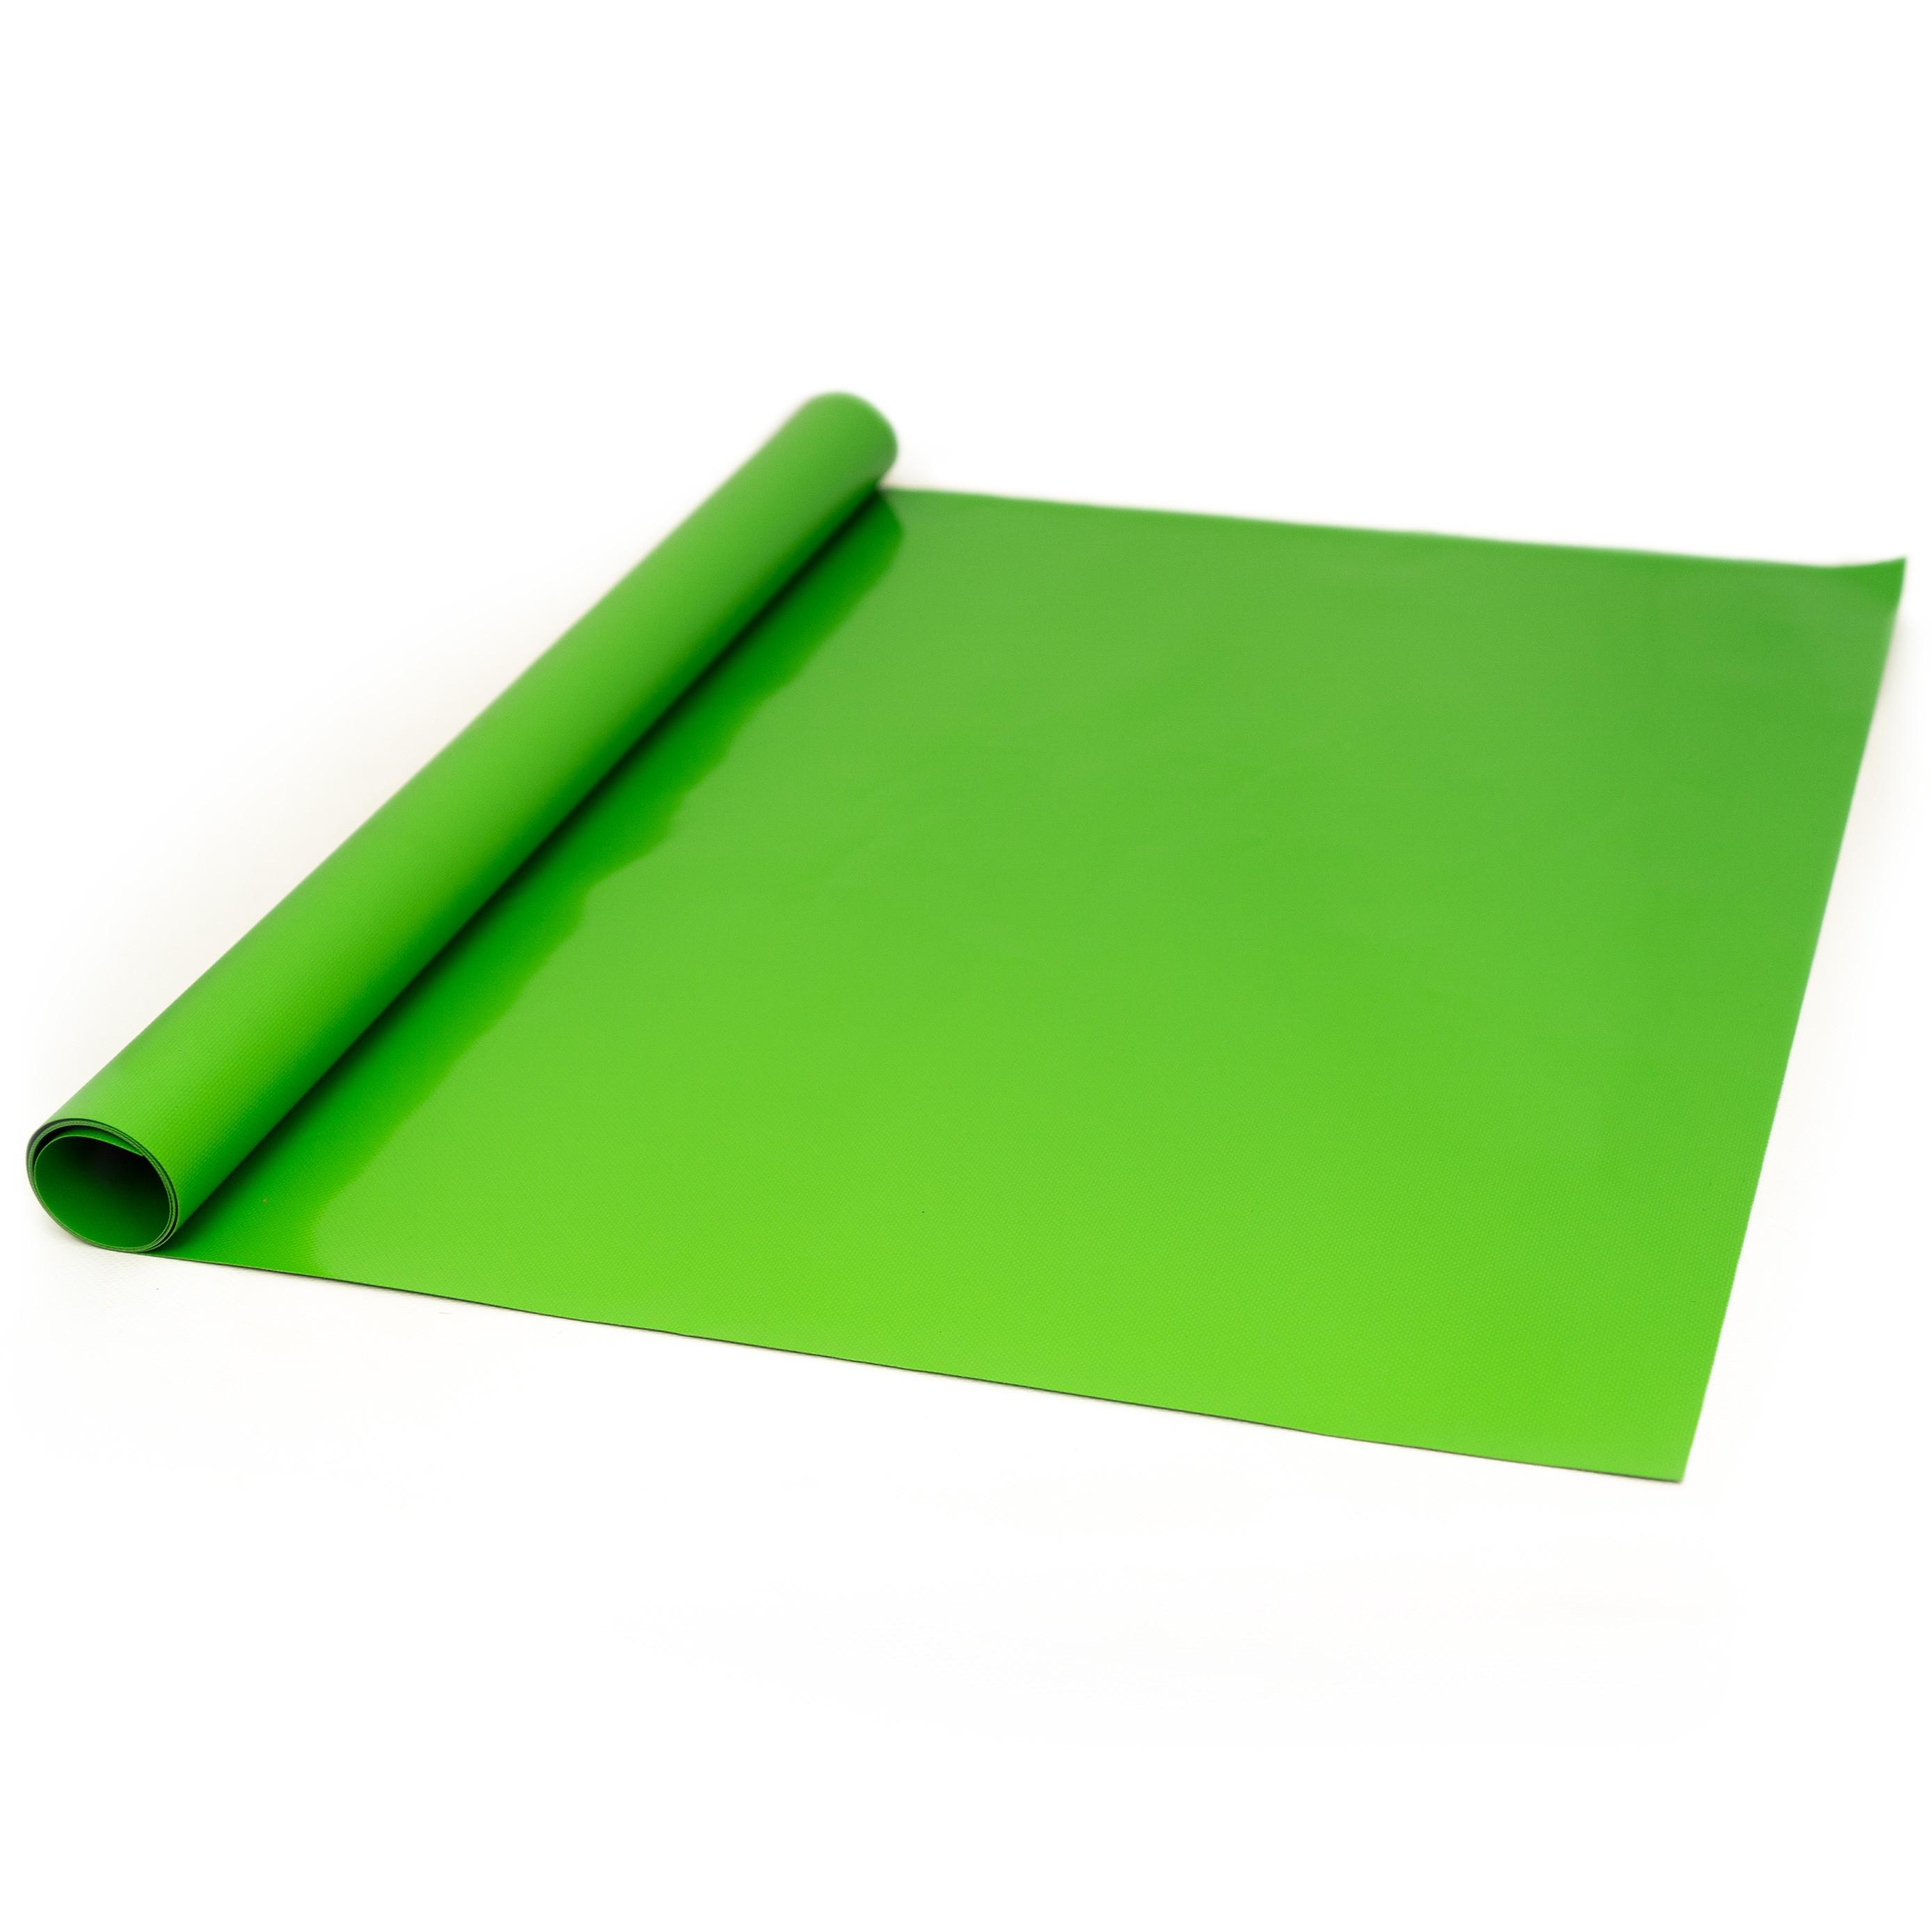 PVC Plane RAL 6018 Gelbgrün 680 gr/m²